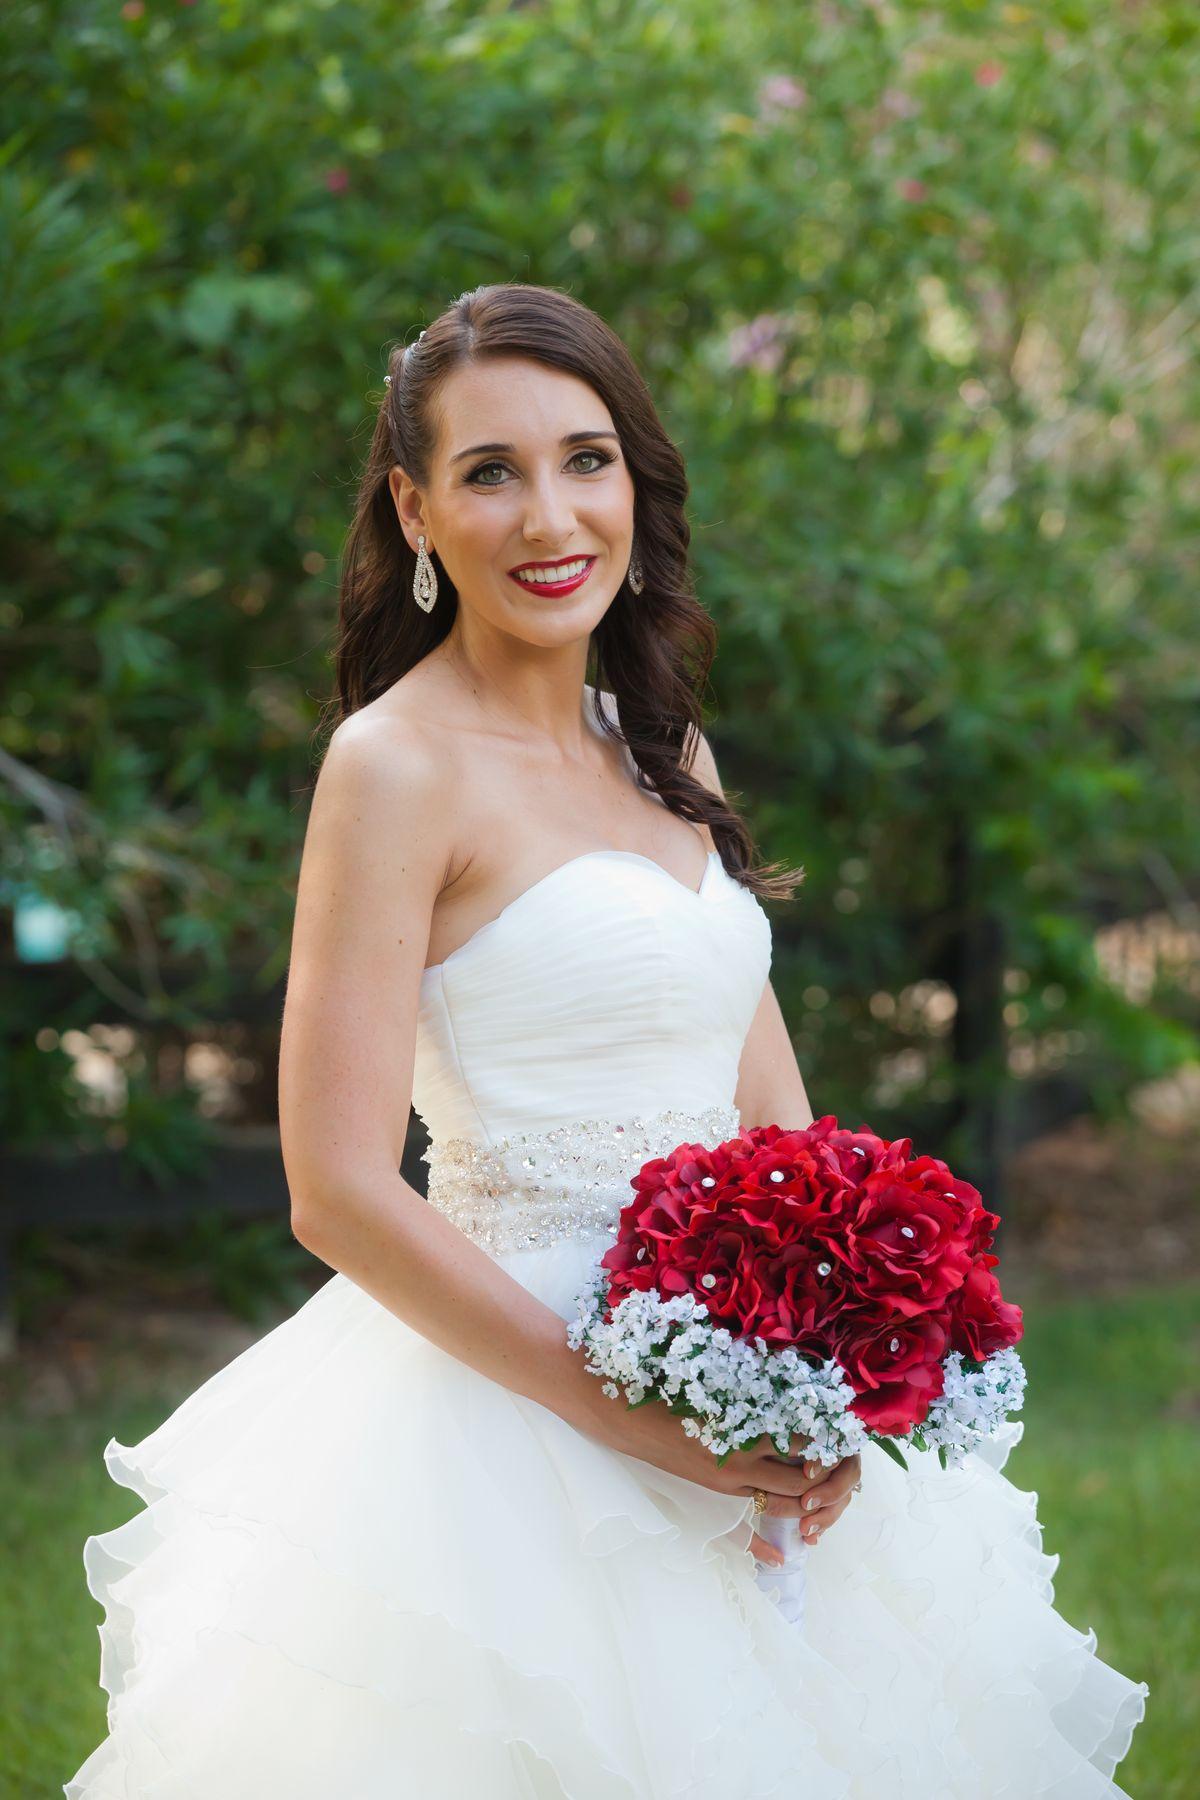 Brides of Houston